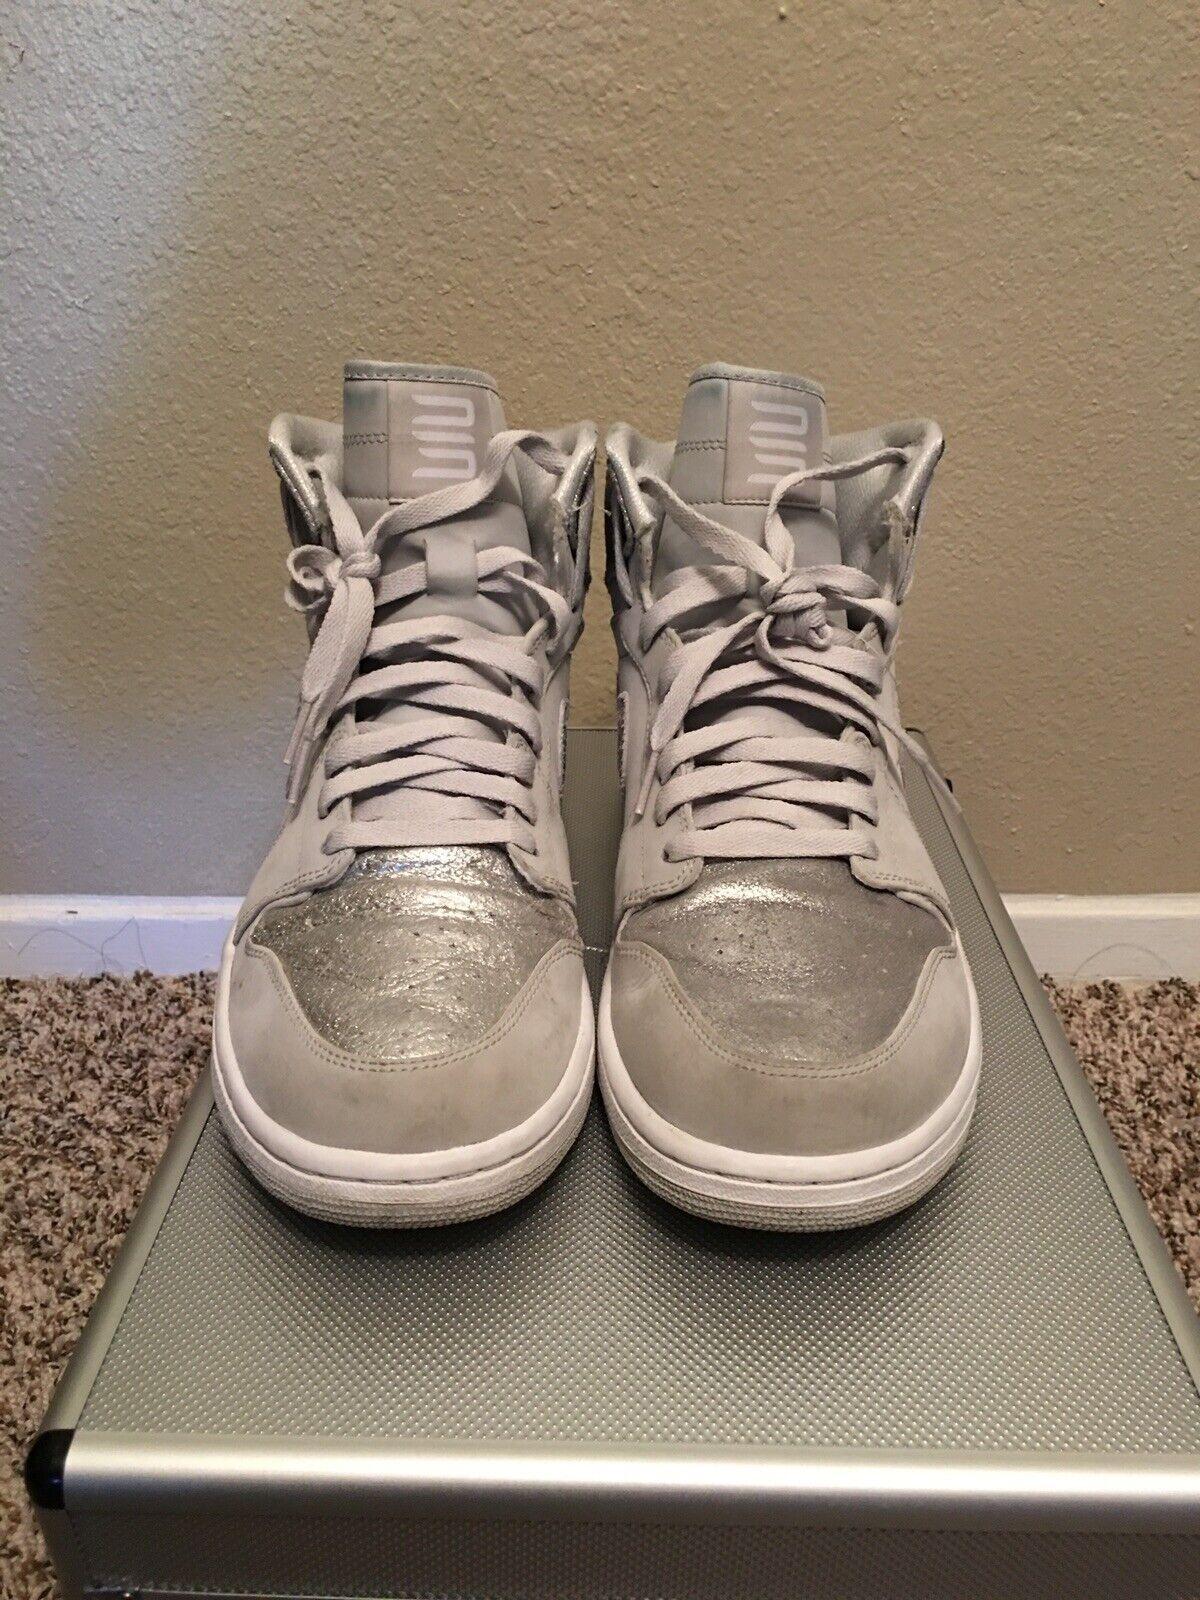 Nike air jordan 1 retro high og Size 12